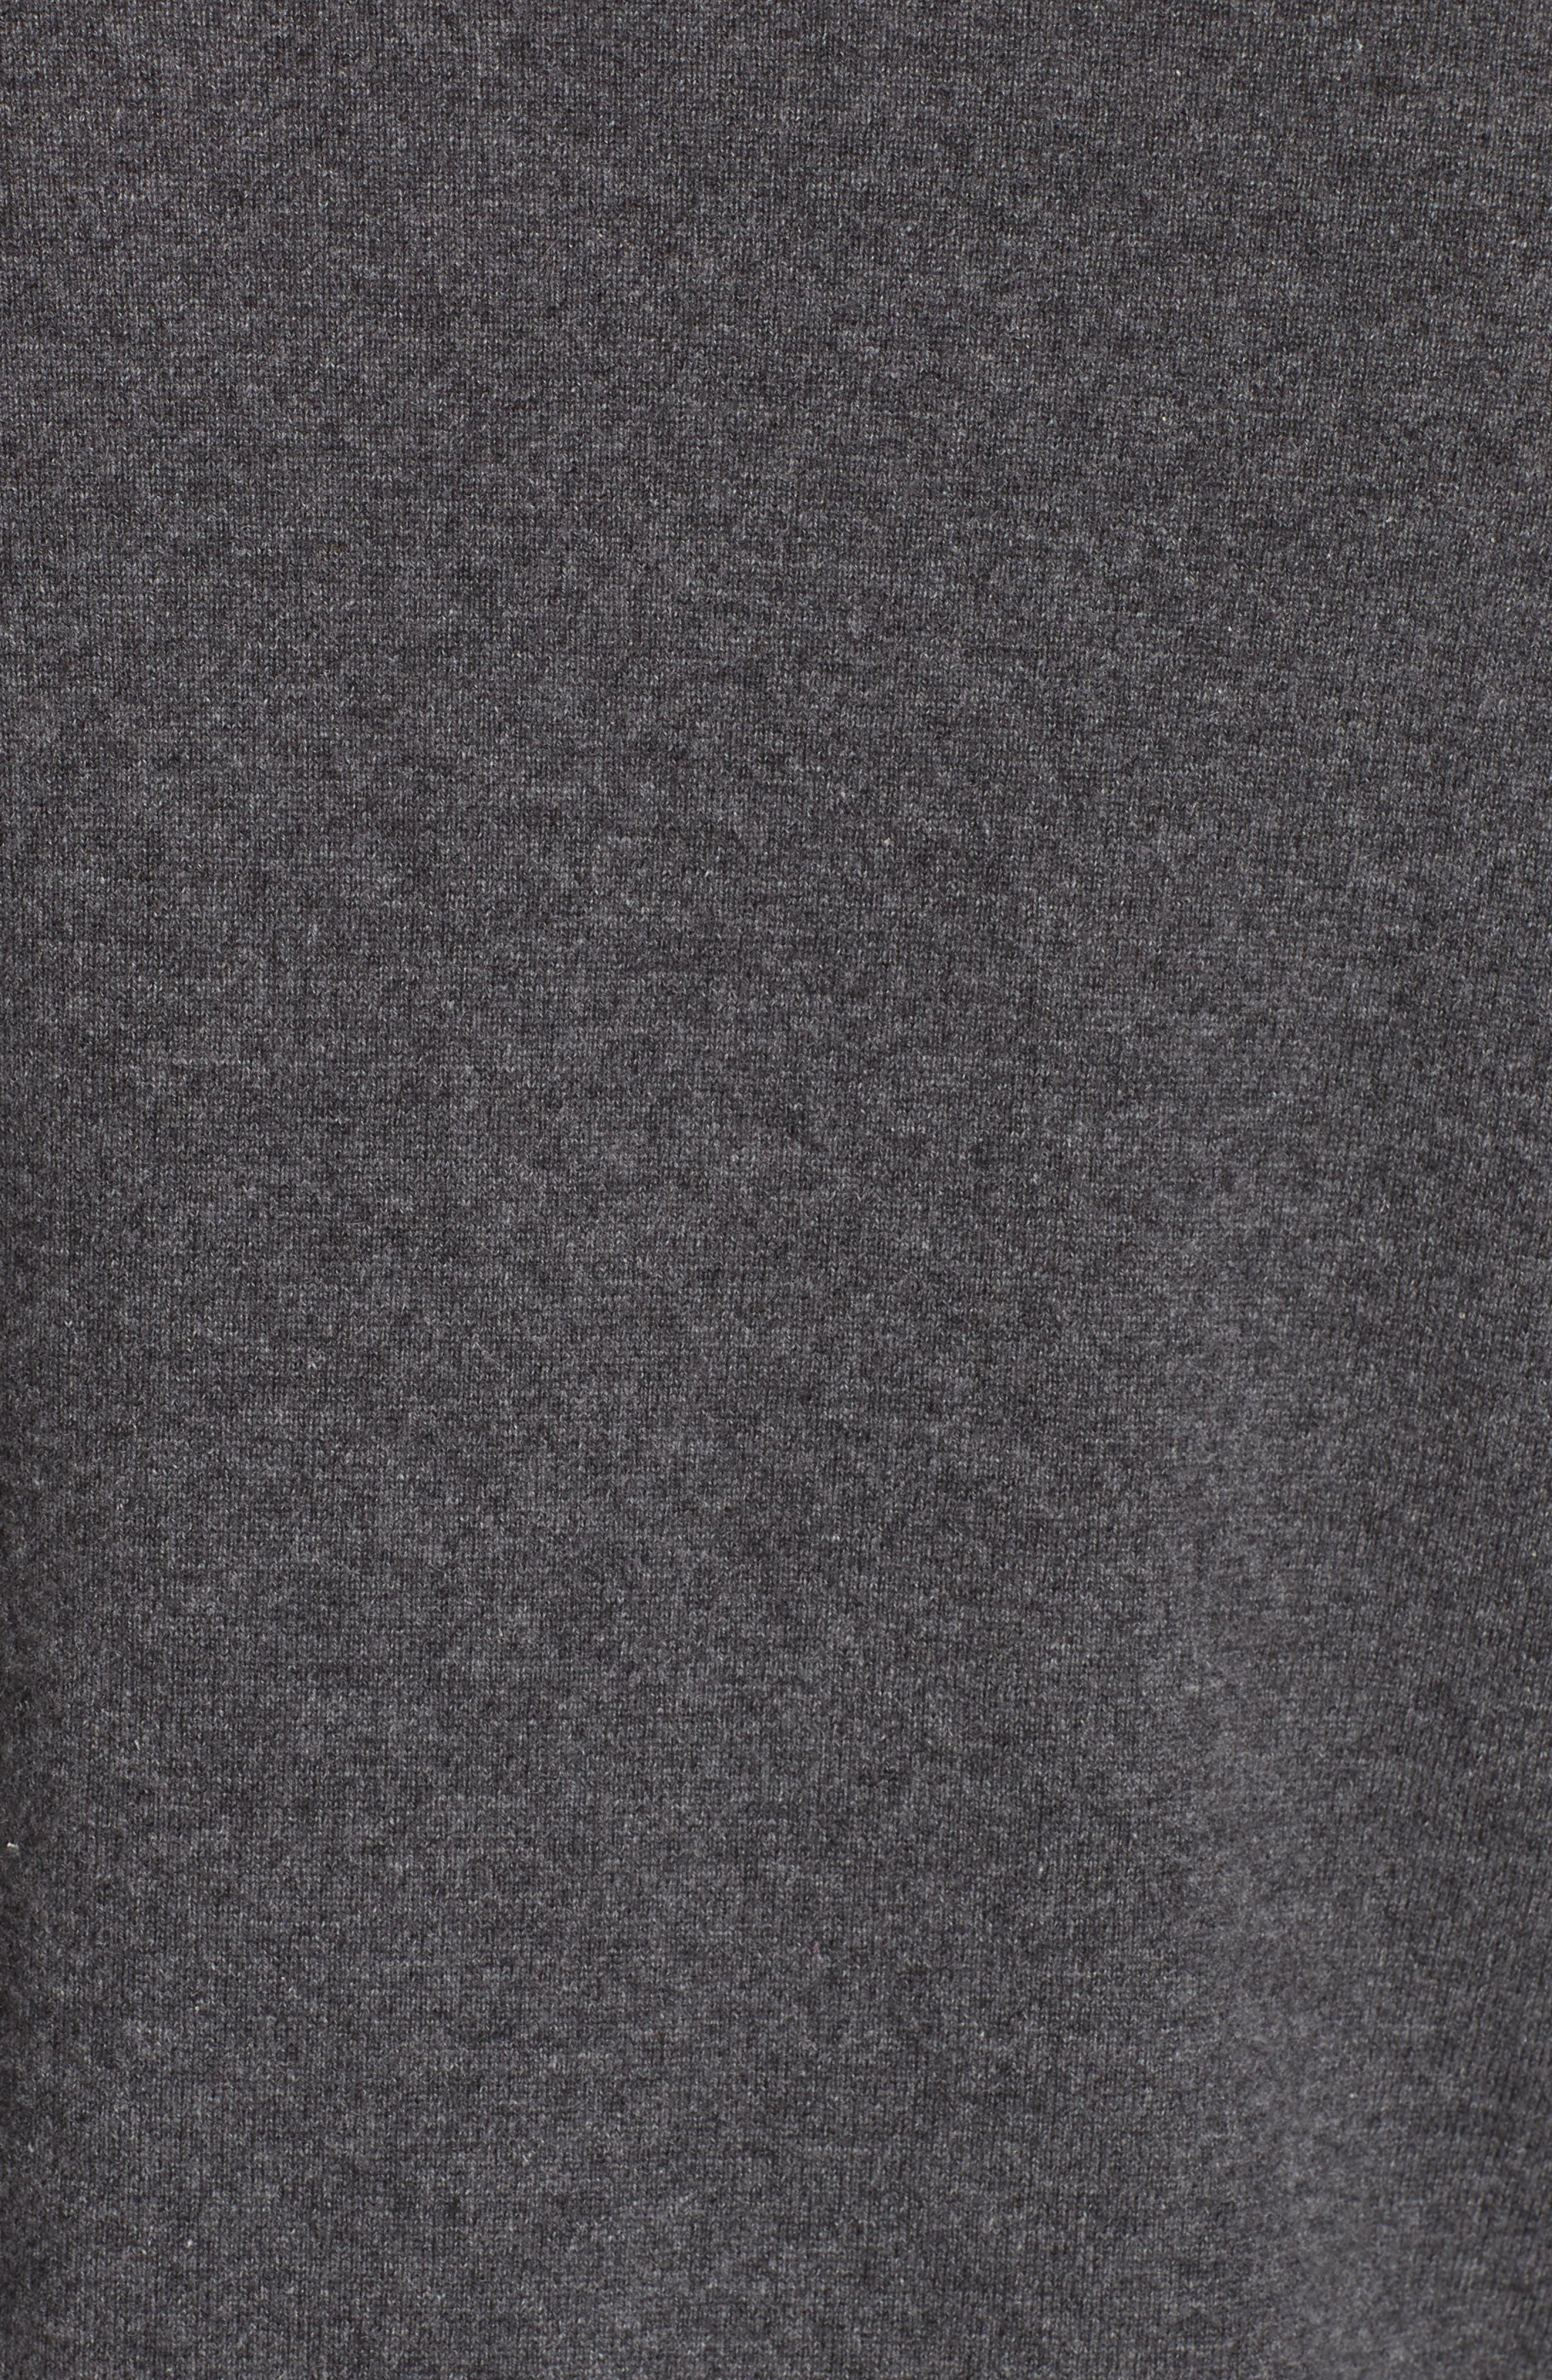 Cashmere Crewneck Sweater,                             Alternate thumbnail 5, color,                             ANTHRACITE